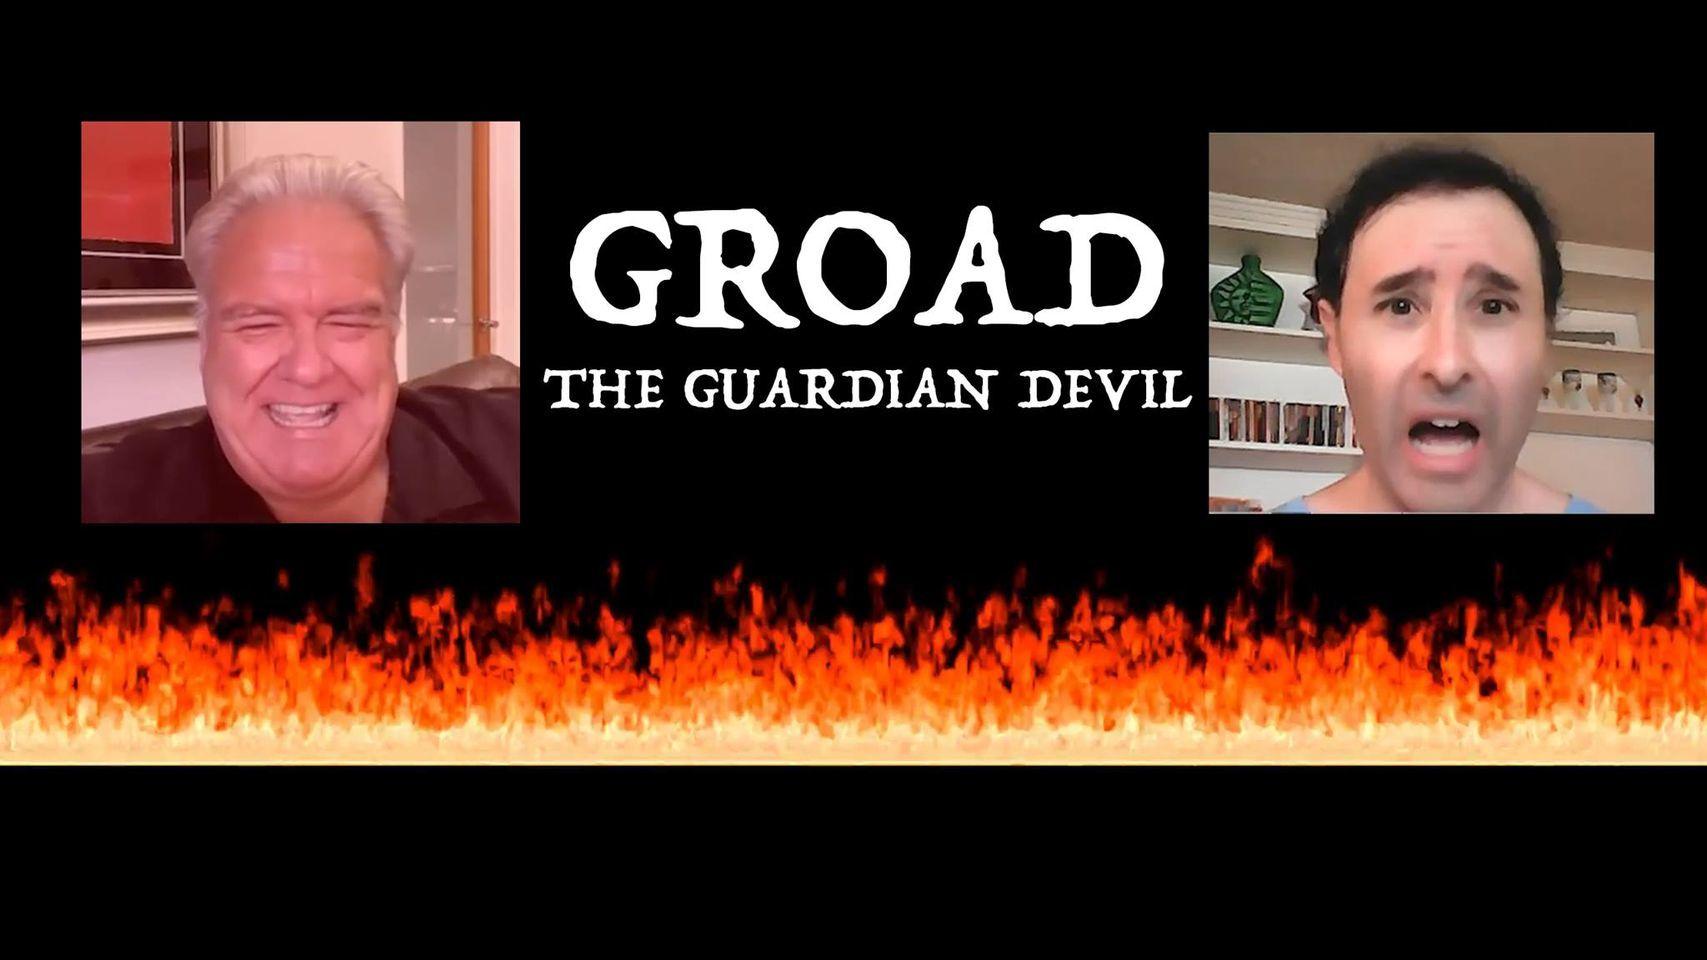 Groad The Guardian Devil